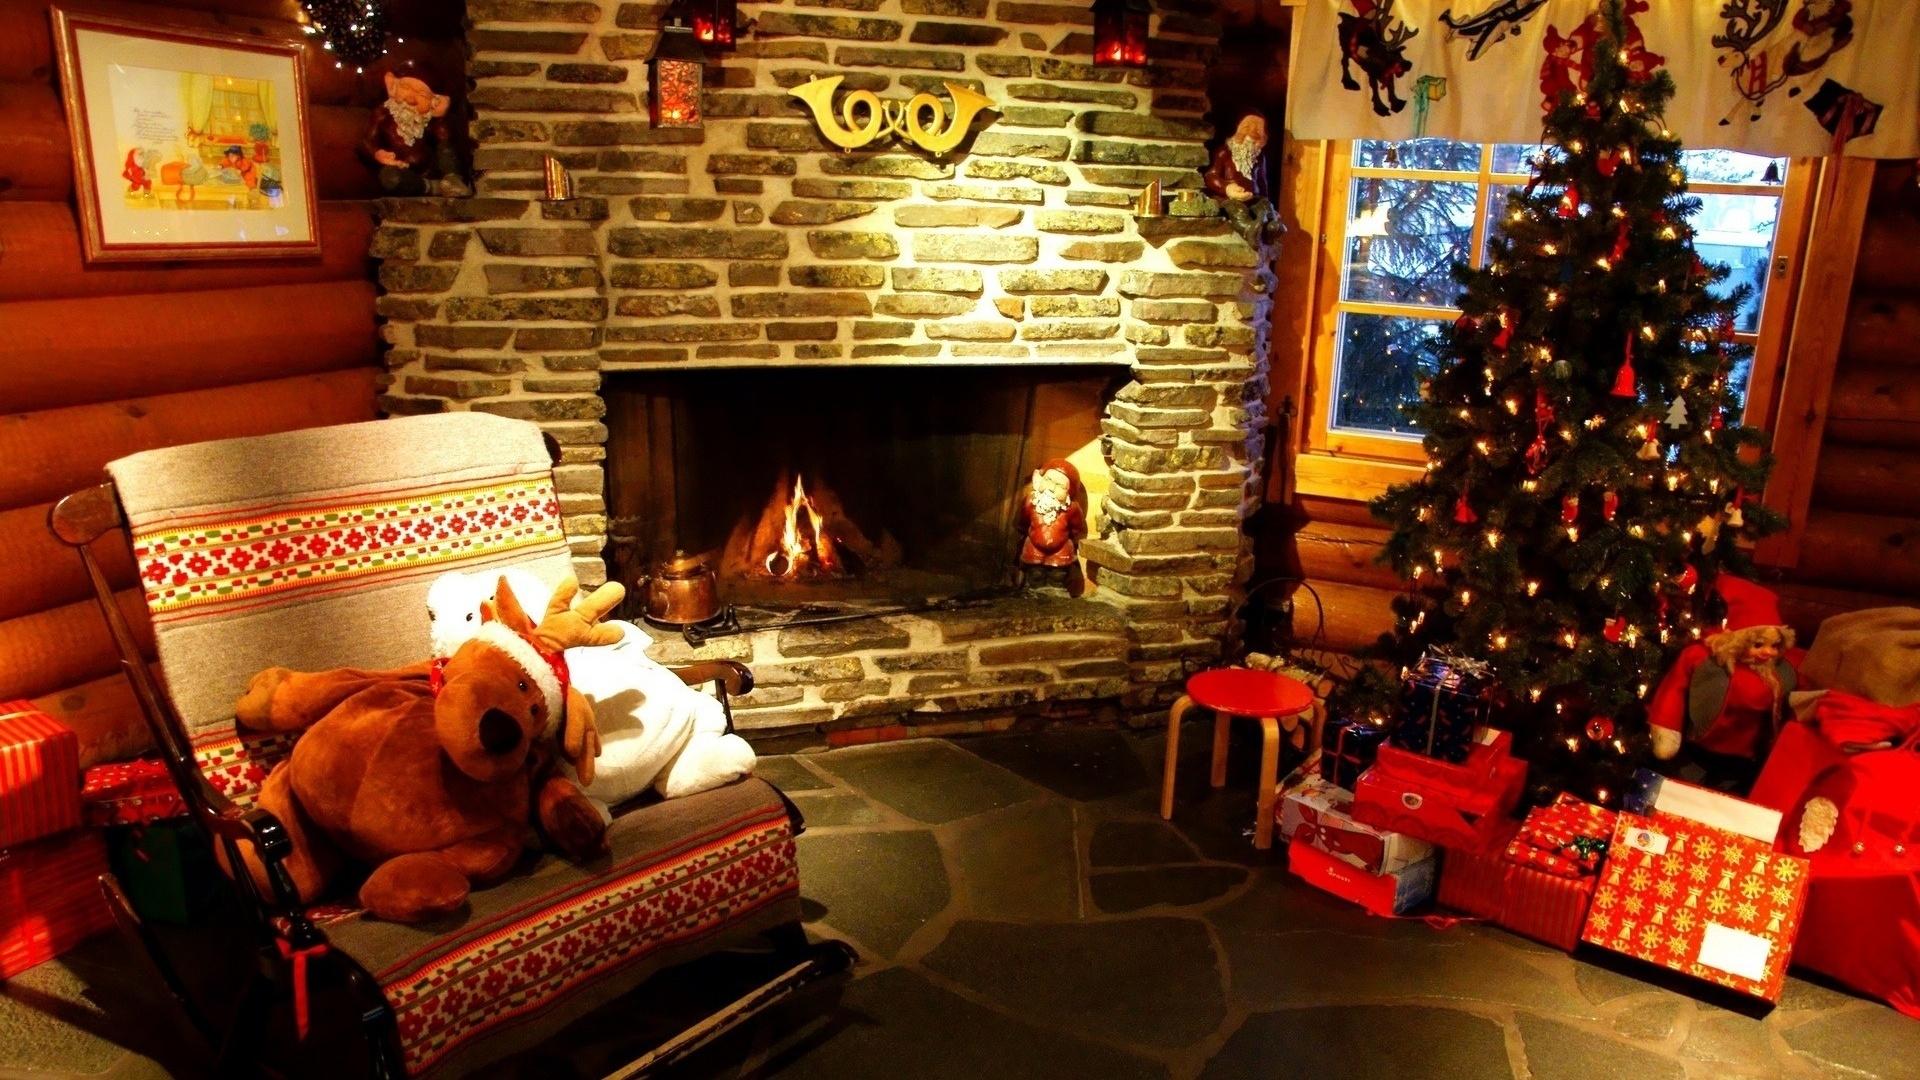 christmas-interior-fireplace-decor-11611